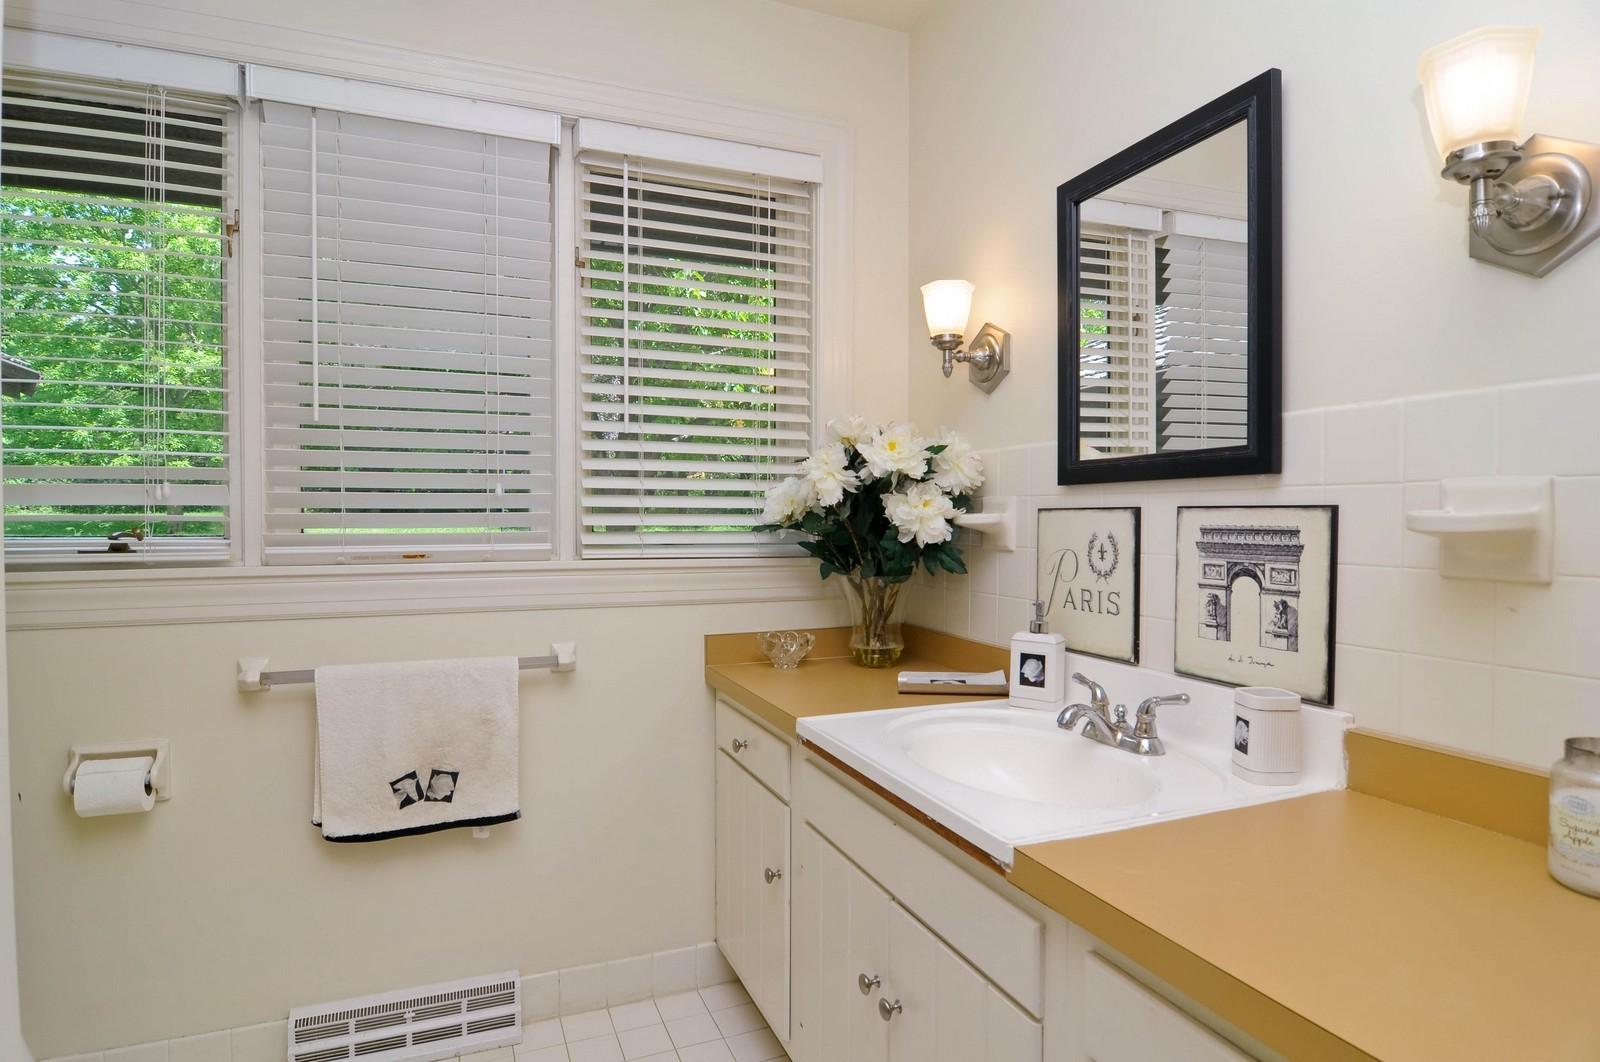 Real Estate Photography - 11 Ridgecroft, Barrington, IL, 60010 - Bathroom